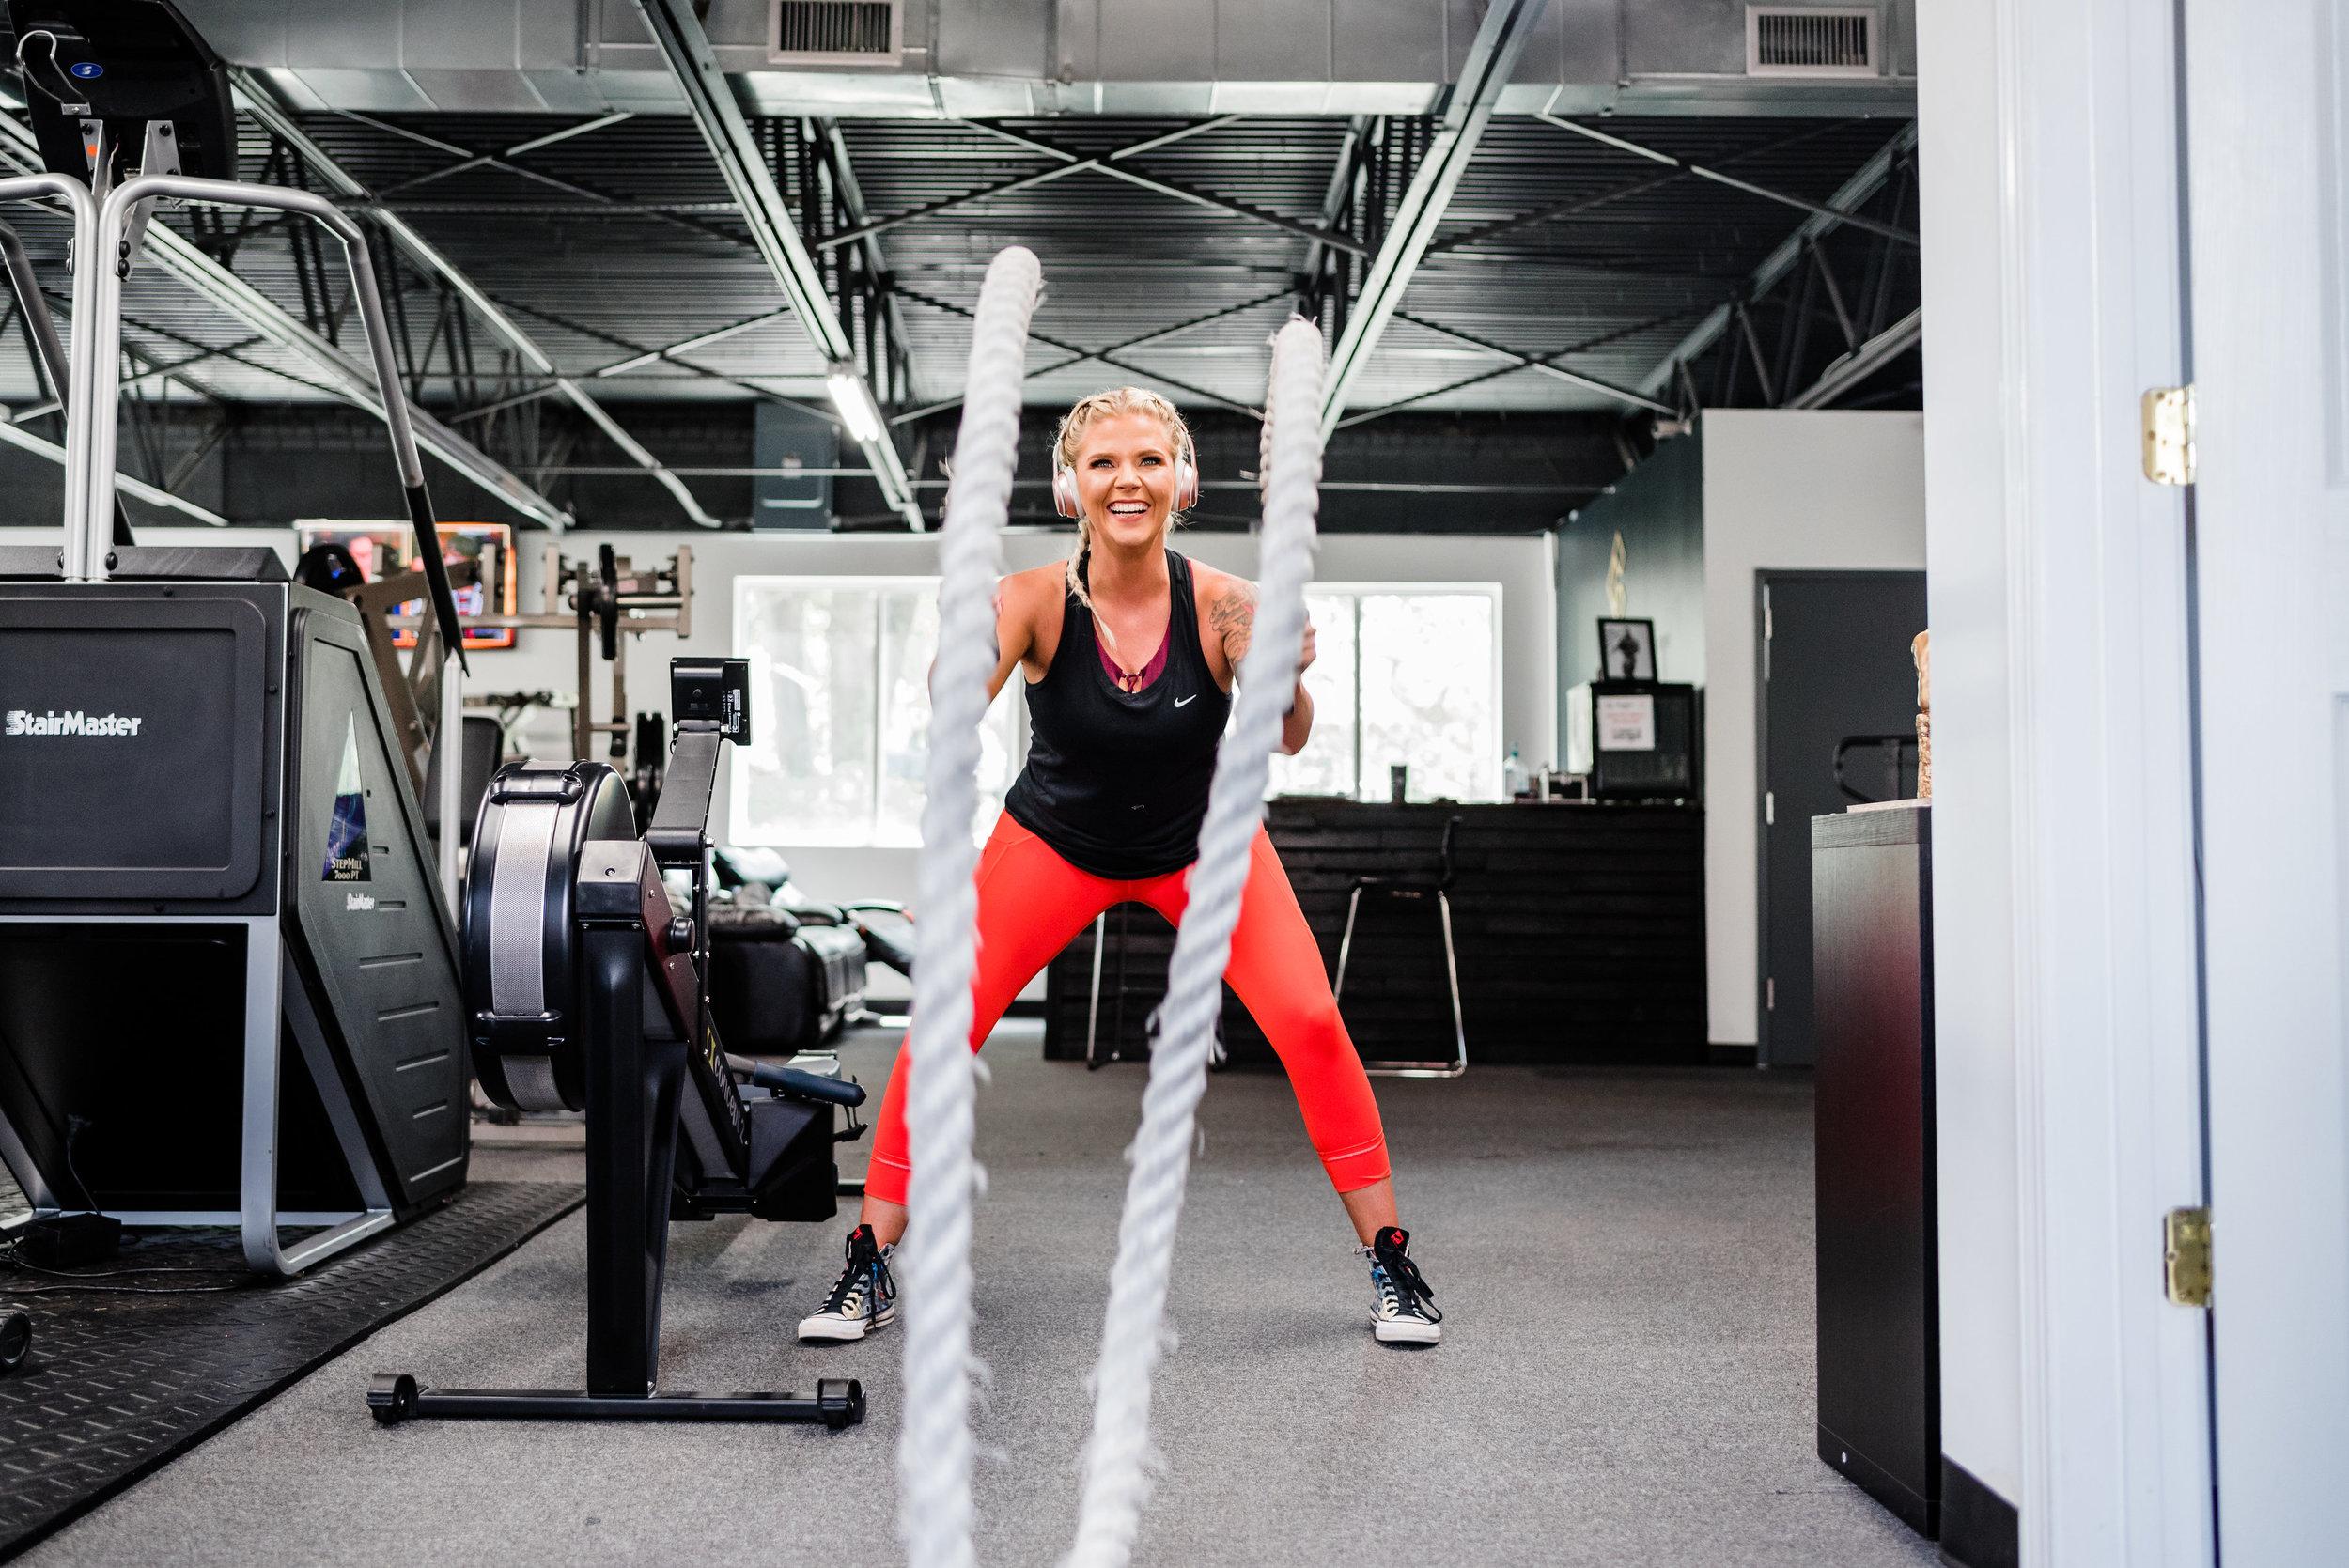 Lisa_workout-36.jpg